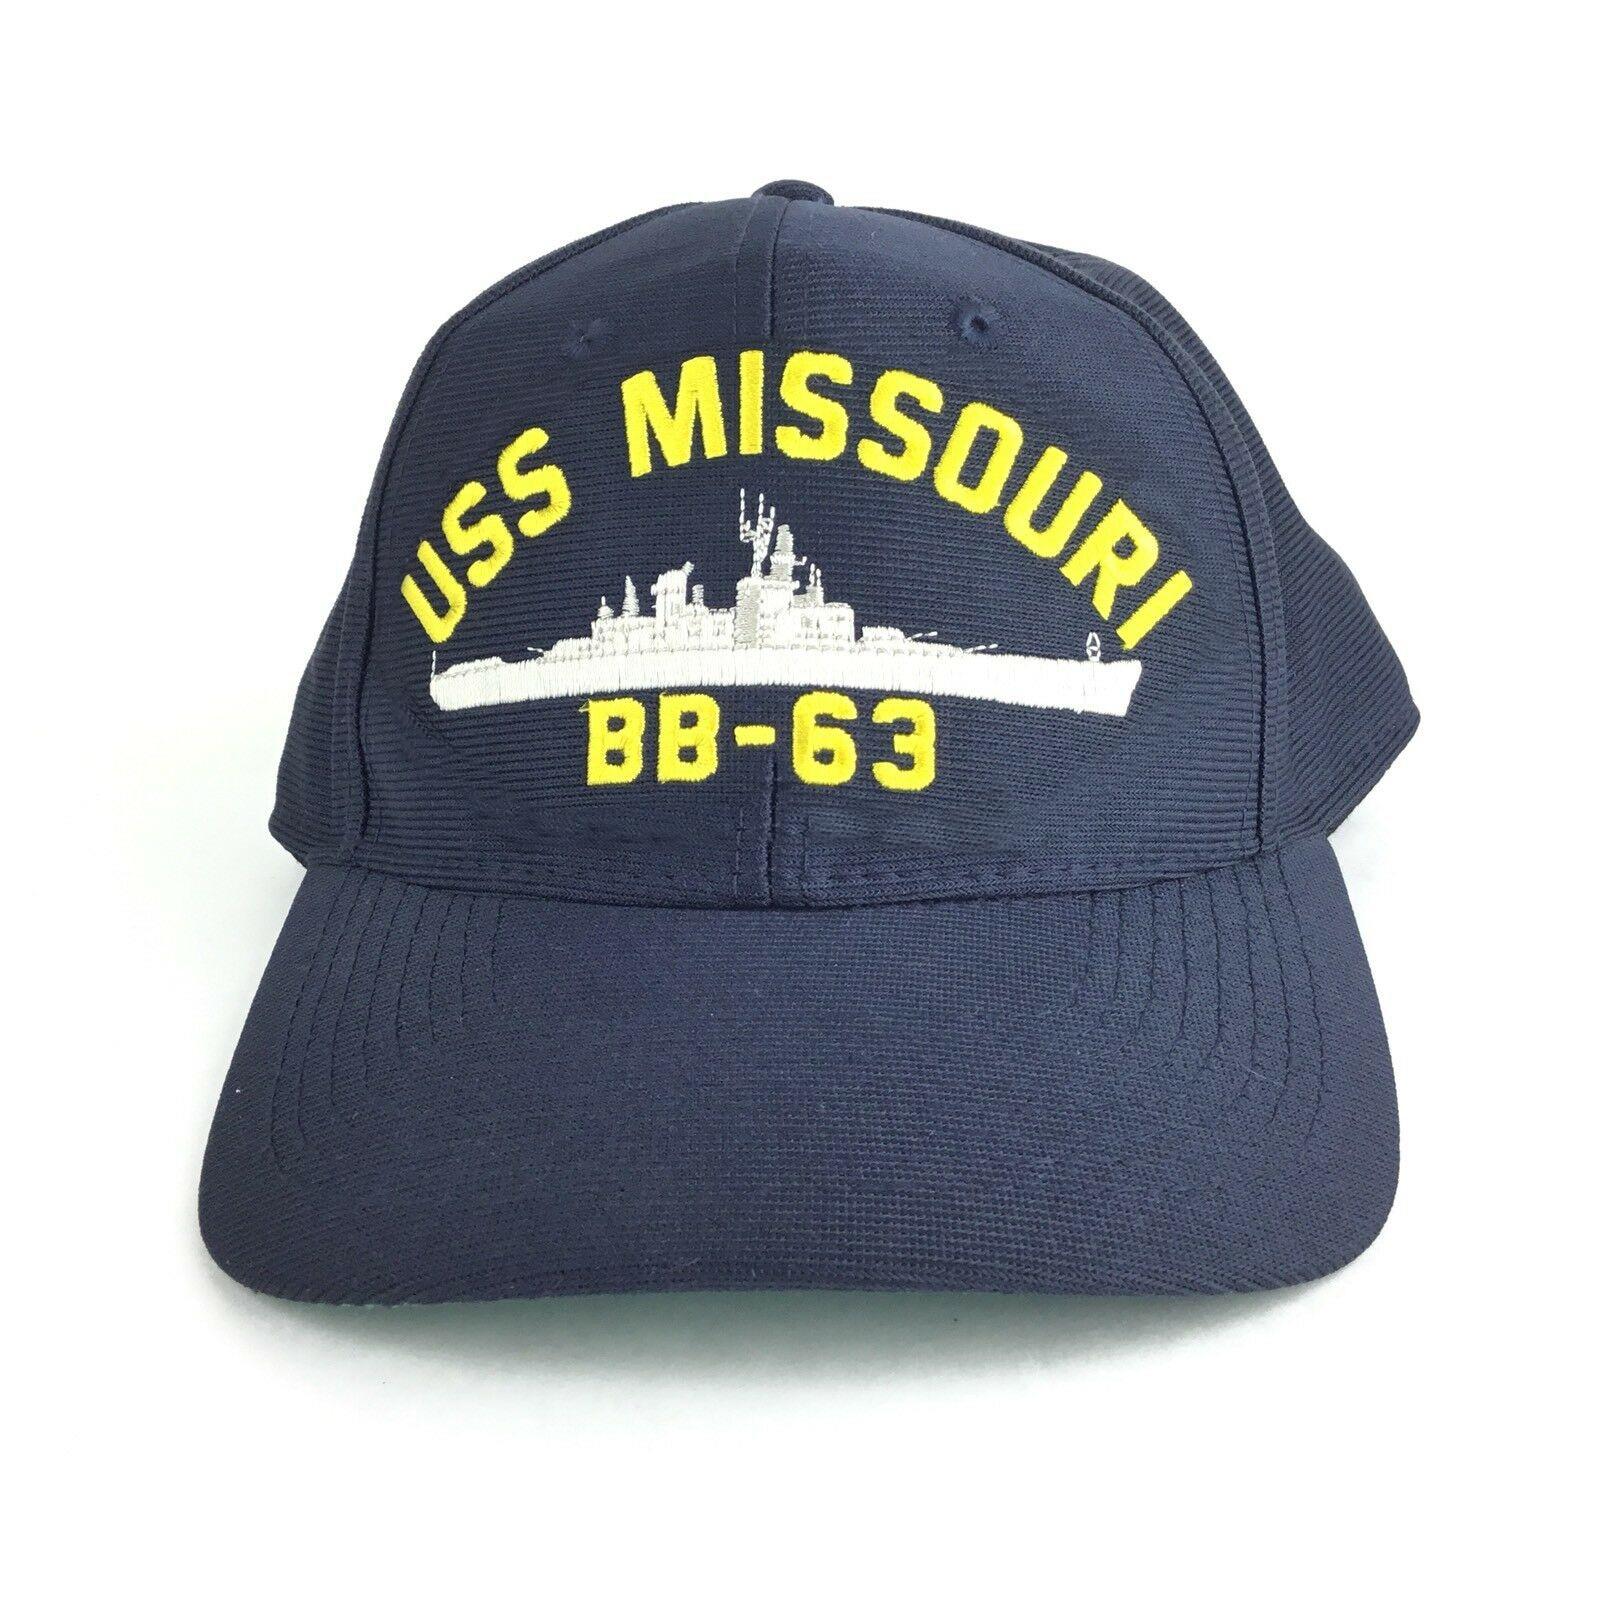 Printing USS Missouri BB 63 (Navy Battleship)   Baseball     Cap   Hat SnapBack Adult